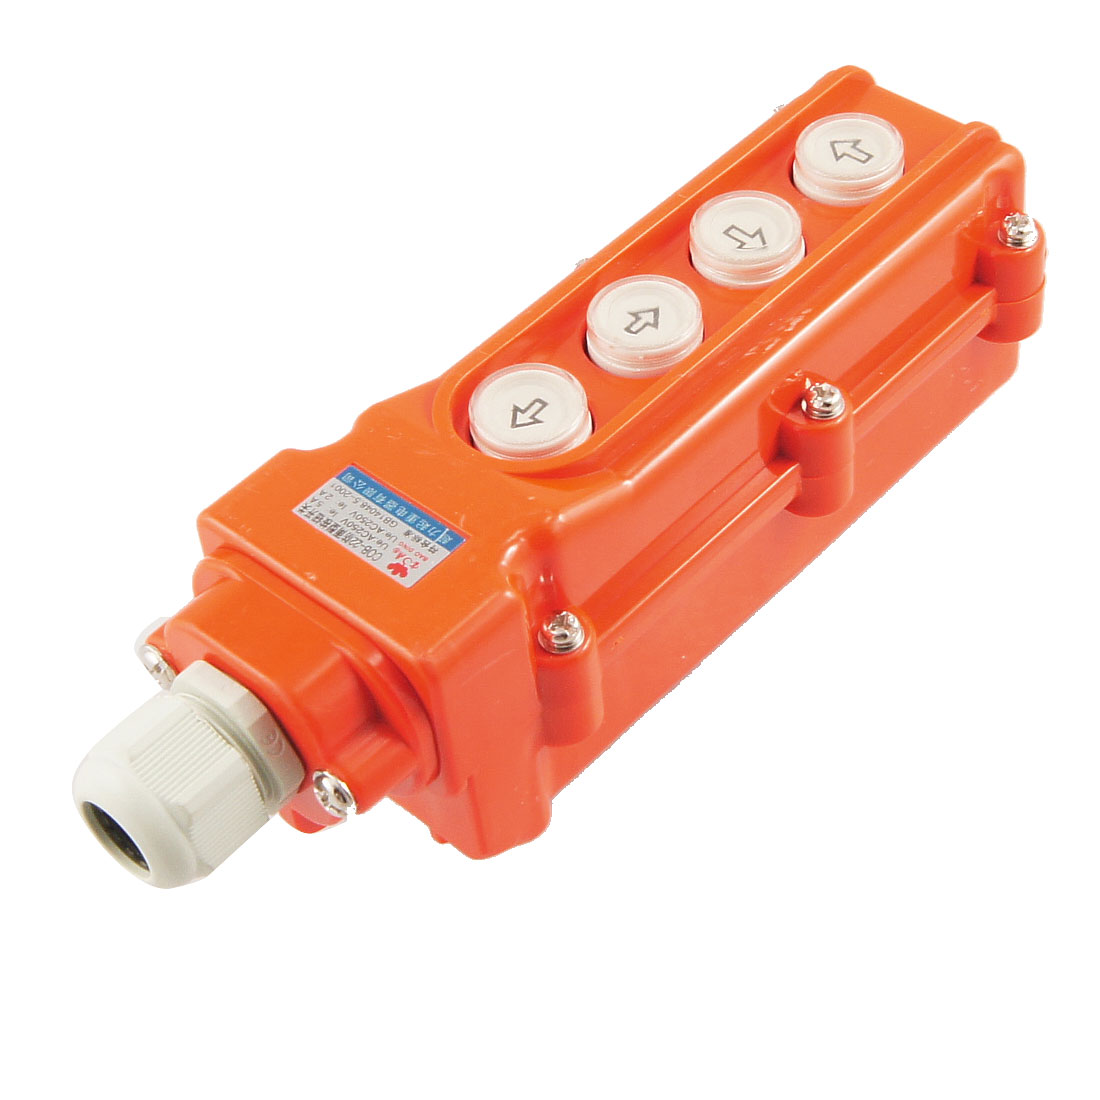 Rainproof 4 Ways Hoist Pushbutton Switch Up Down AC 250V 5A 250V 2A 3x10mm 5a 250v